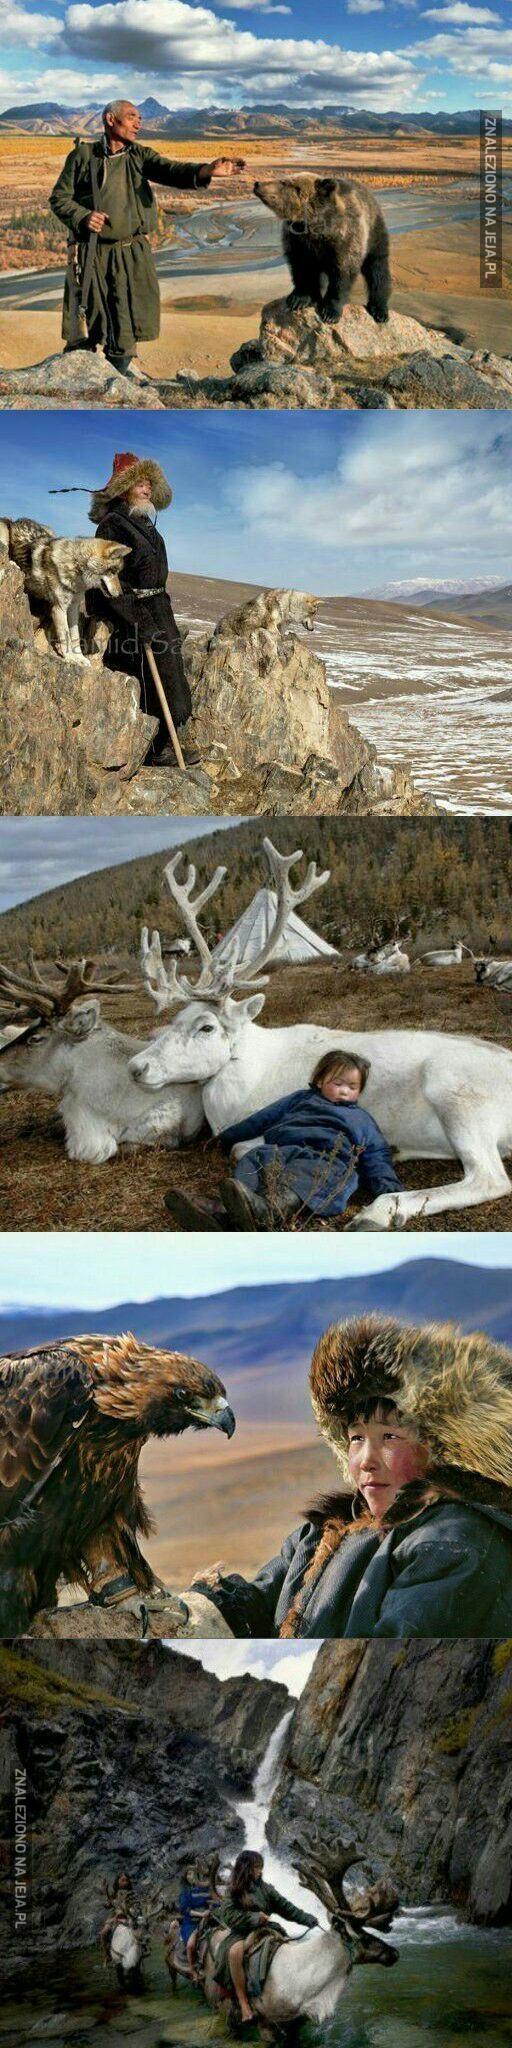 Plemię blisko z naturą